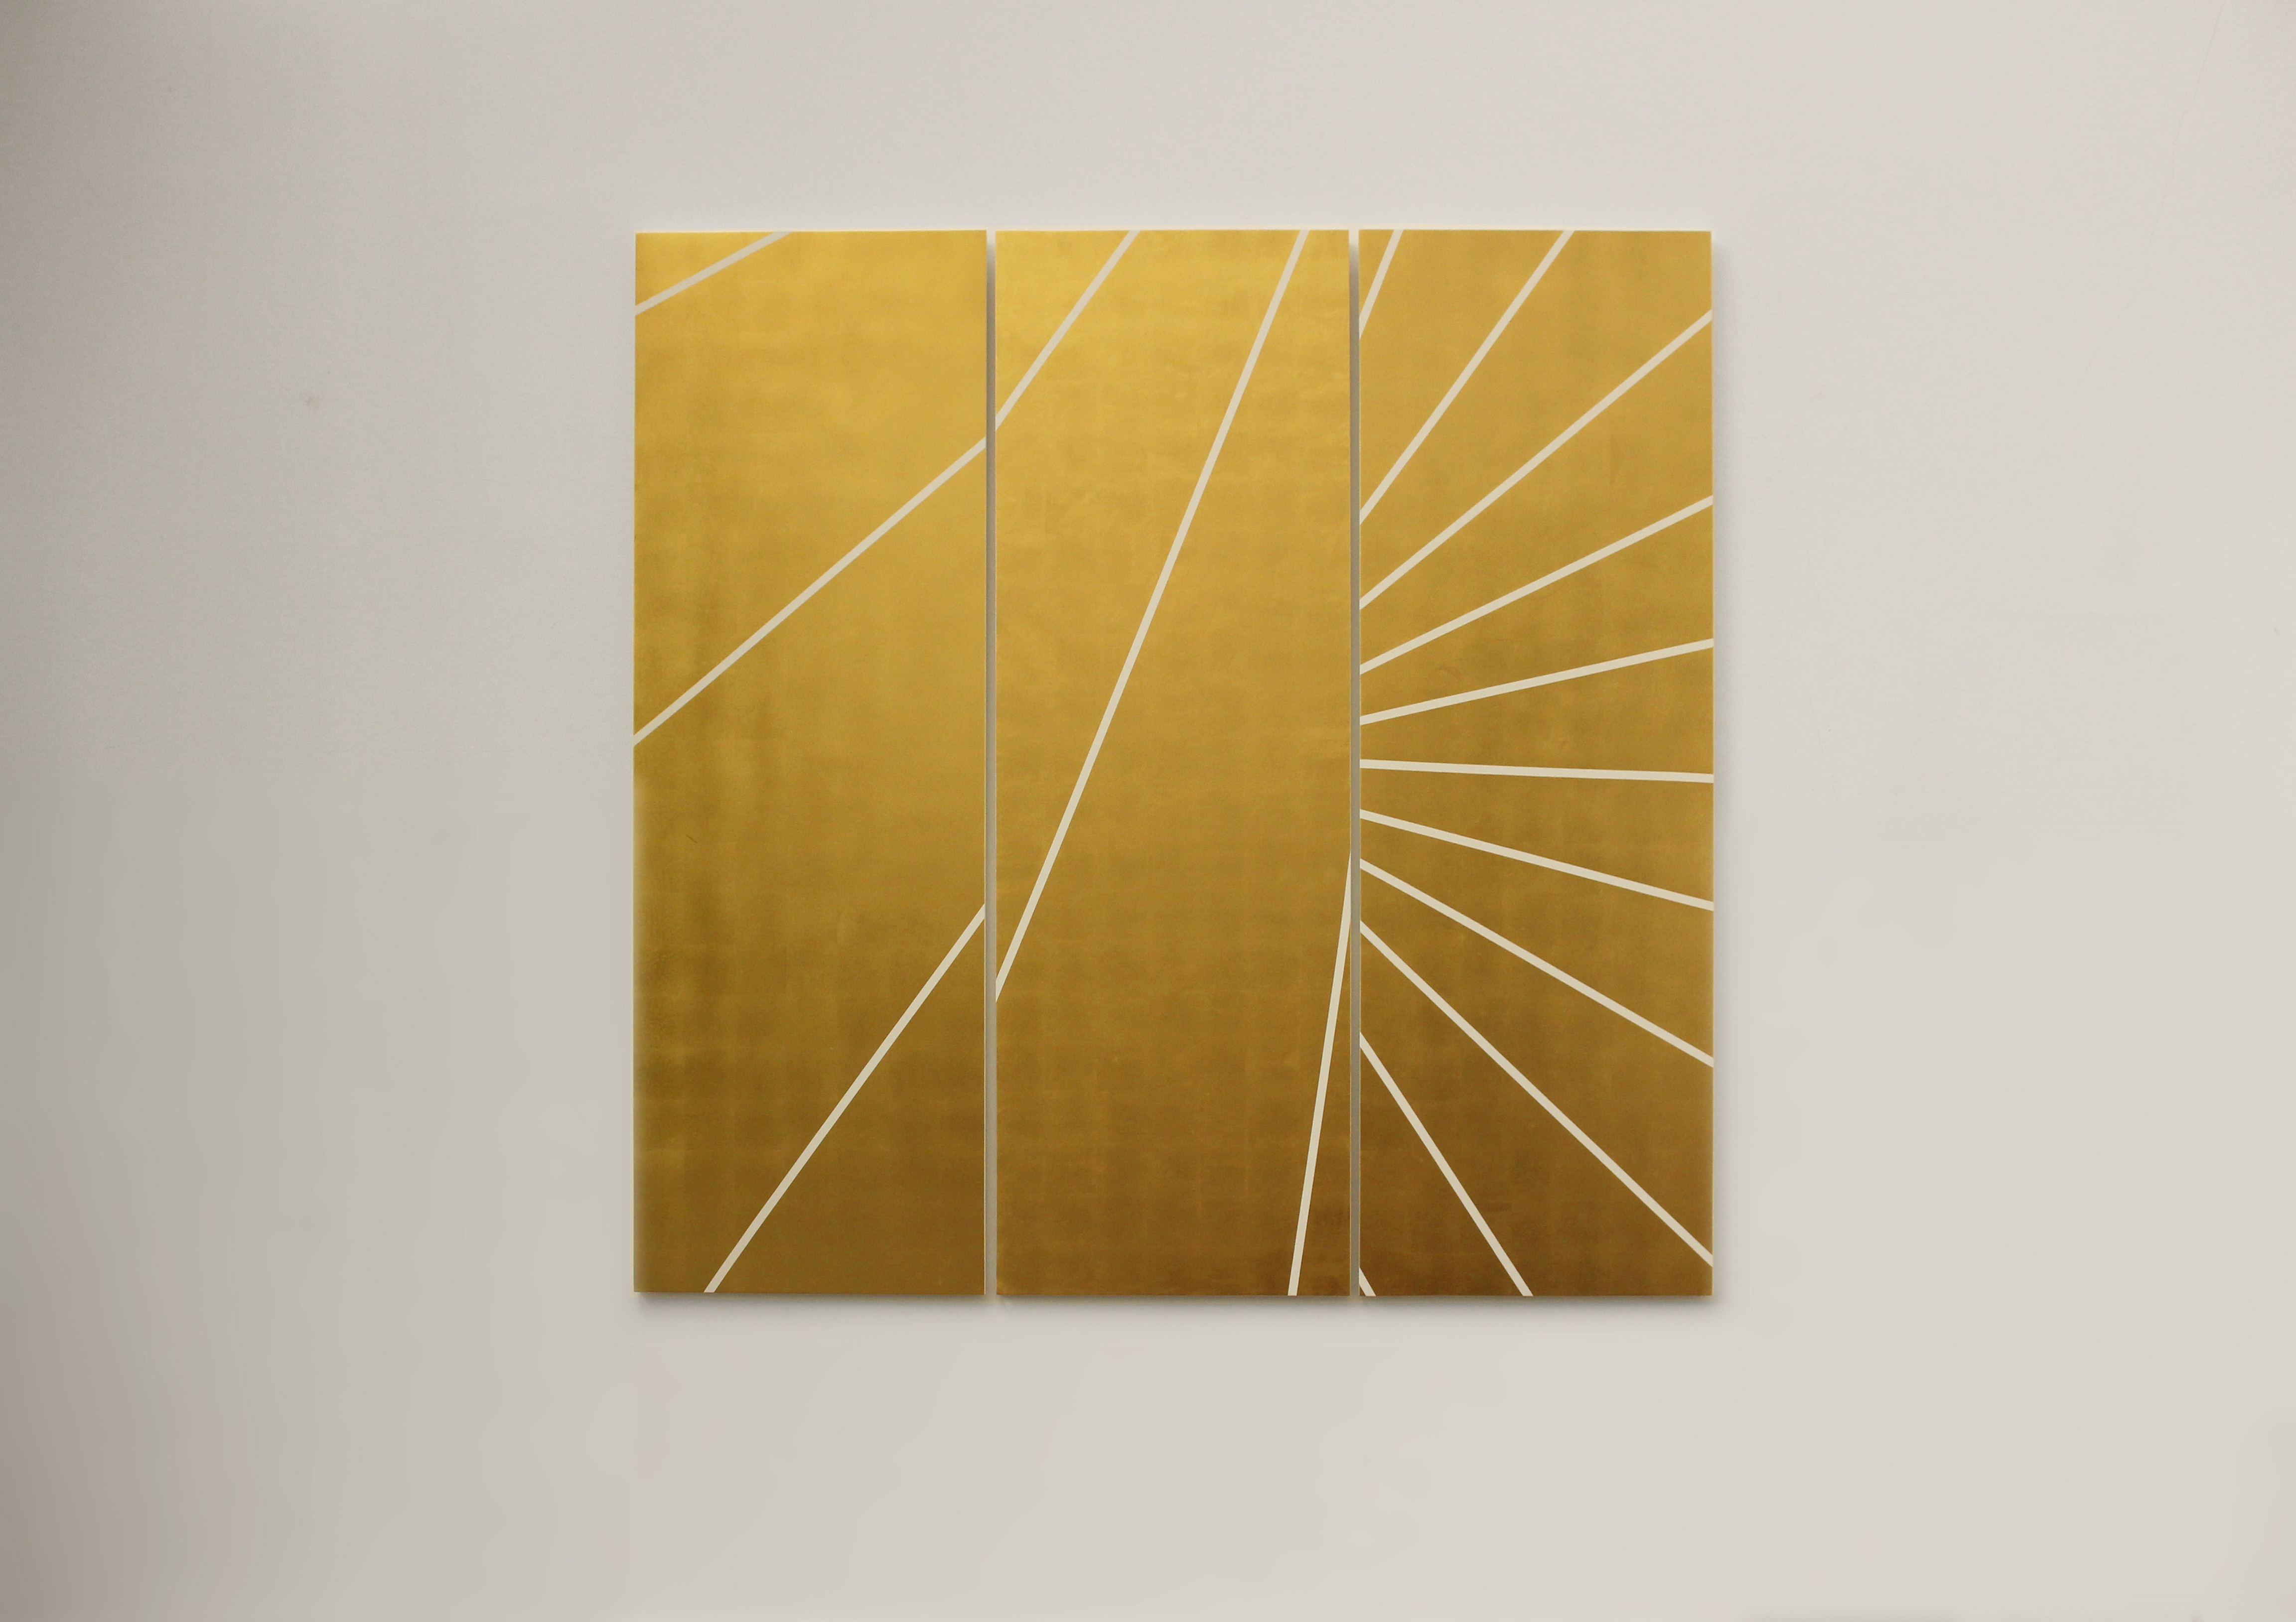 2019,  gold leaf on wood,  150×153 cm,  unique work